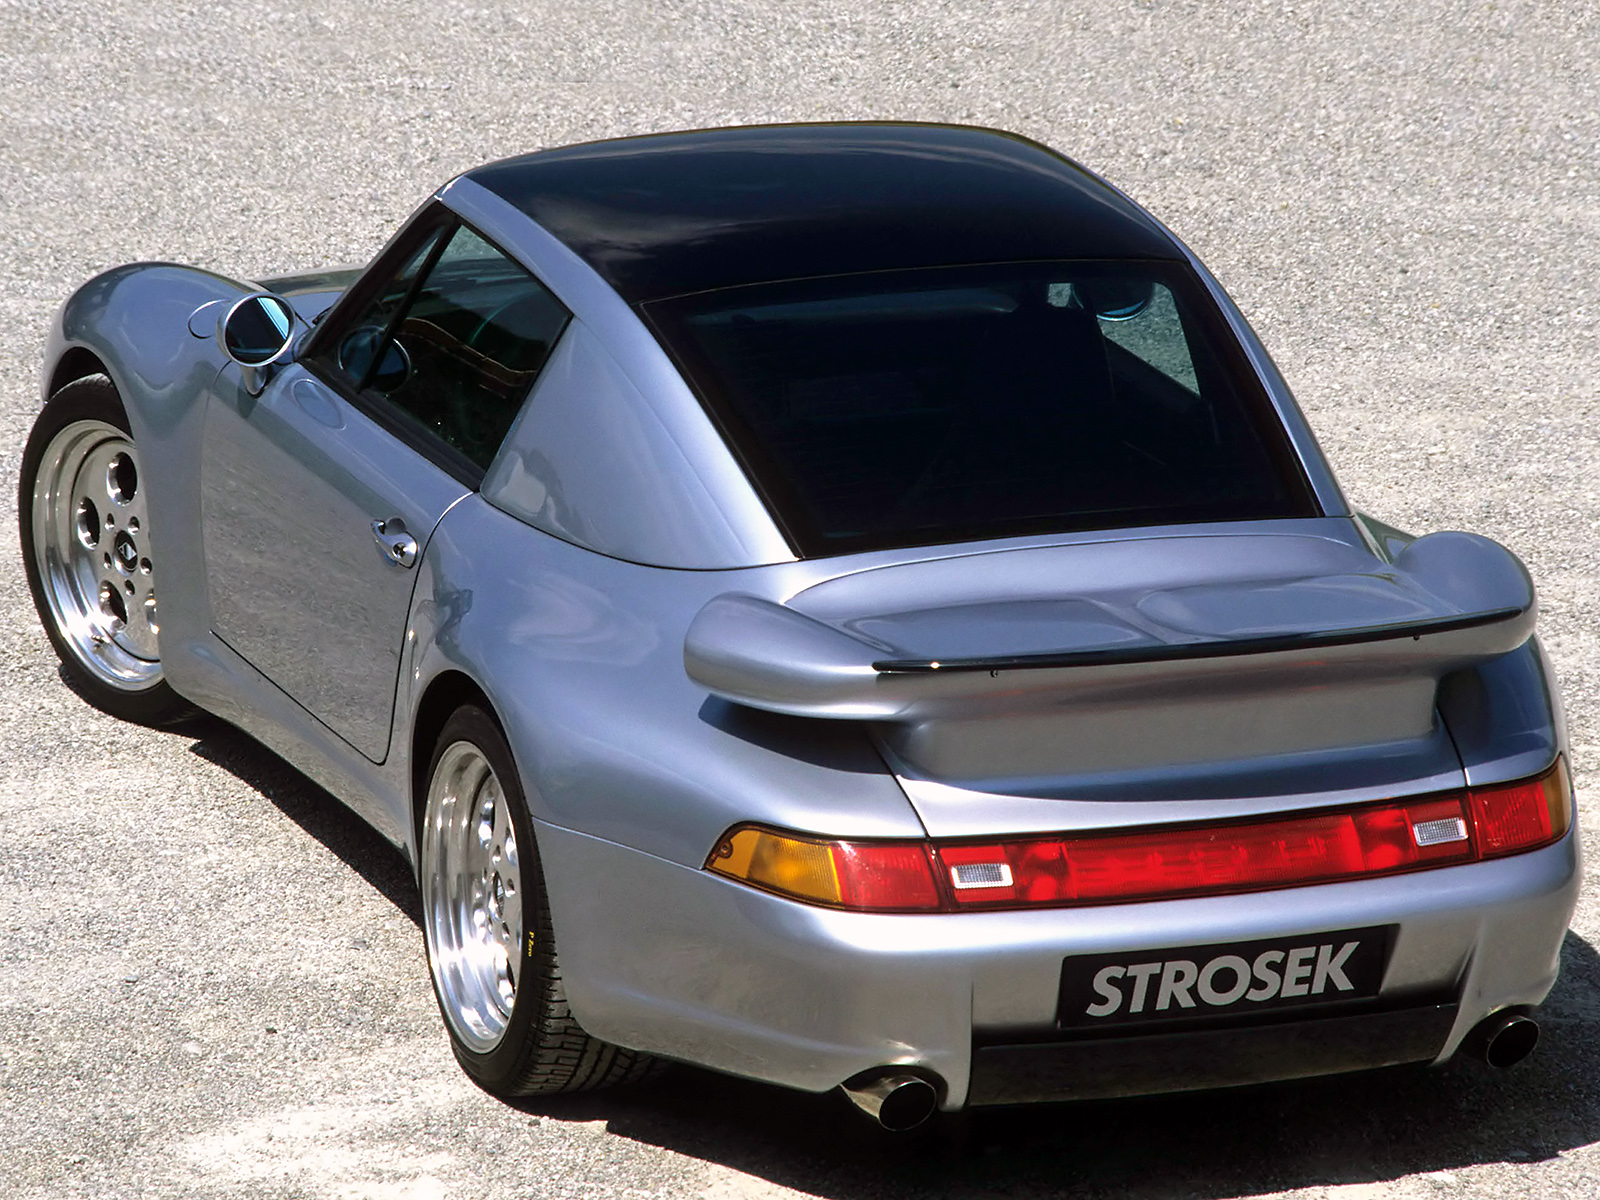 Strosek Porsche 911 Turbo 993 Photos Photogallery With